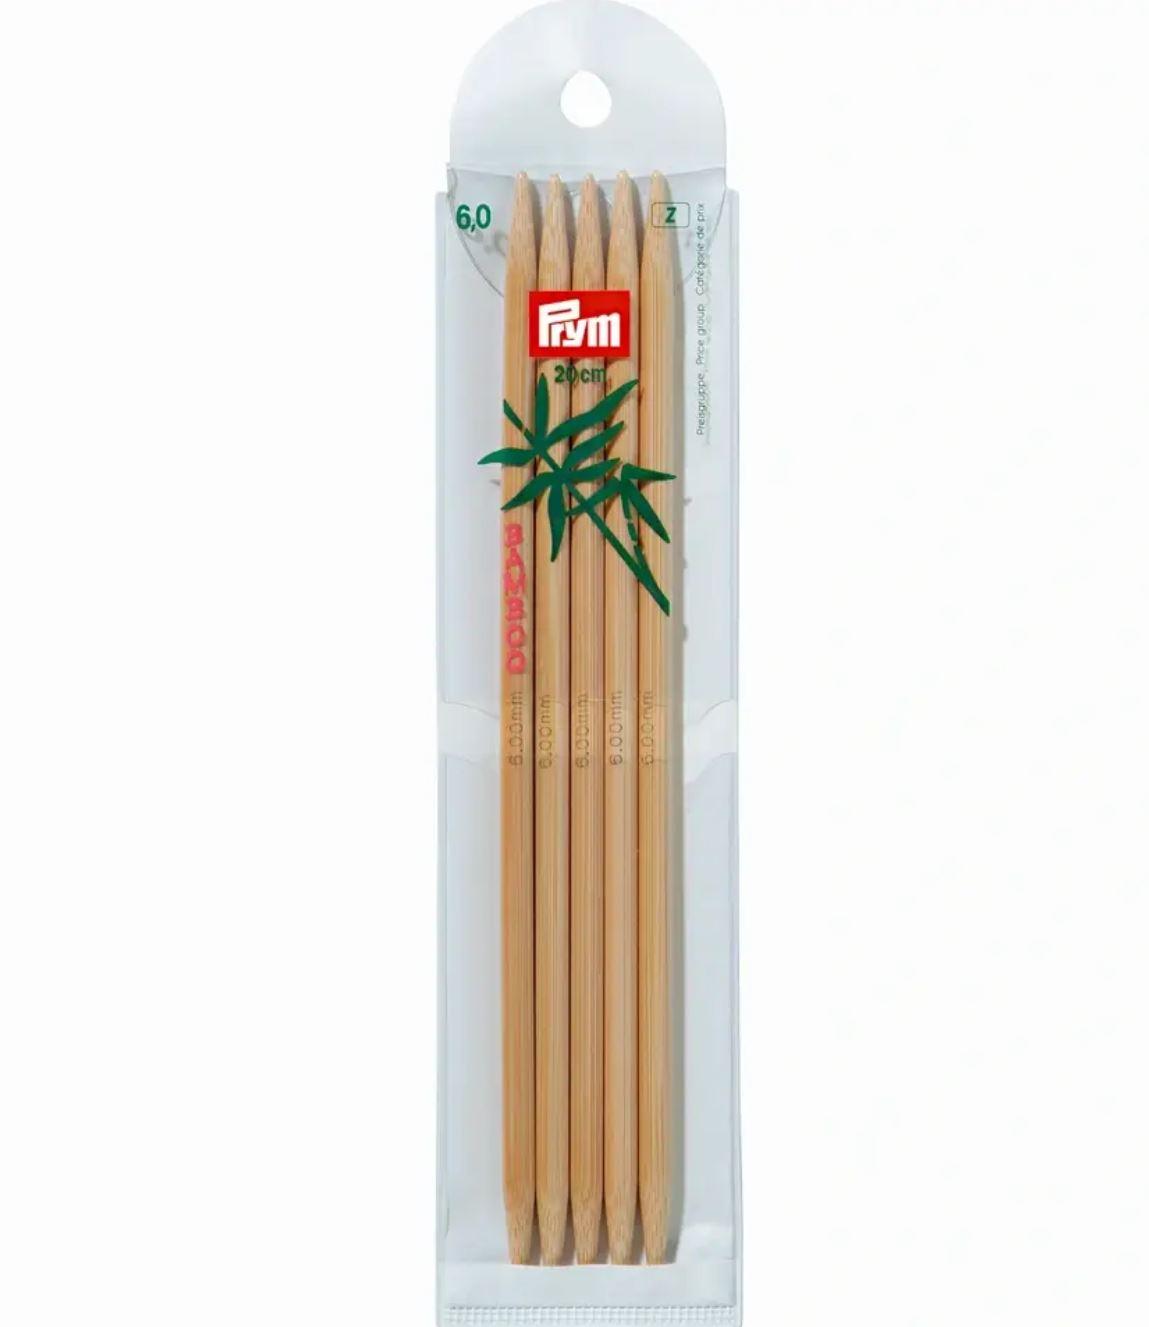 Prym Bamboo Settpinne 5stk - Bambus - 6,0 - 20cm